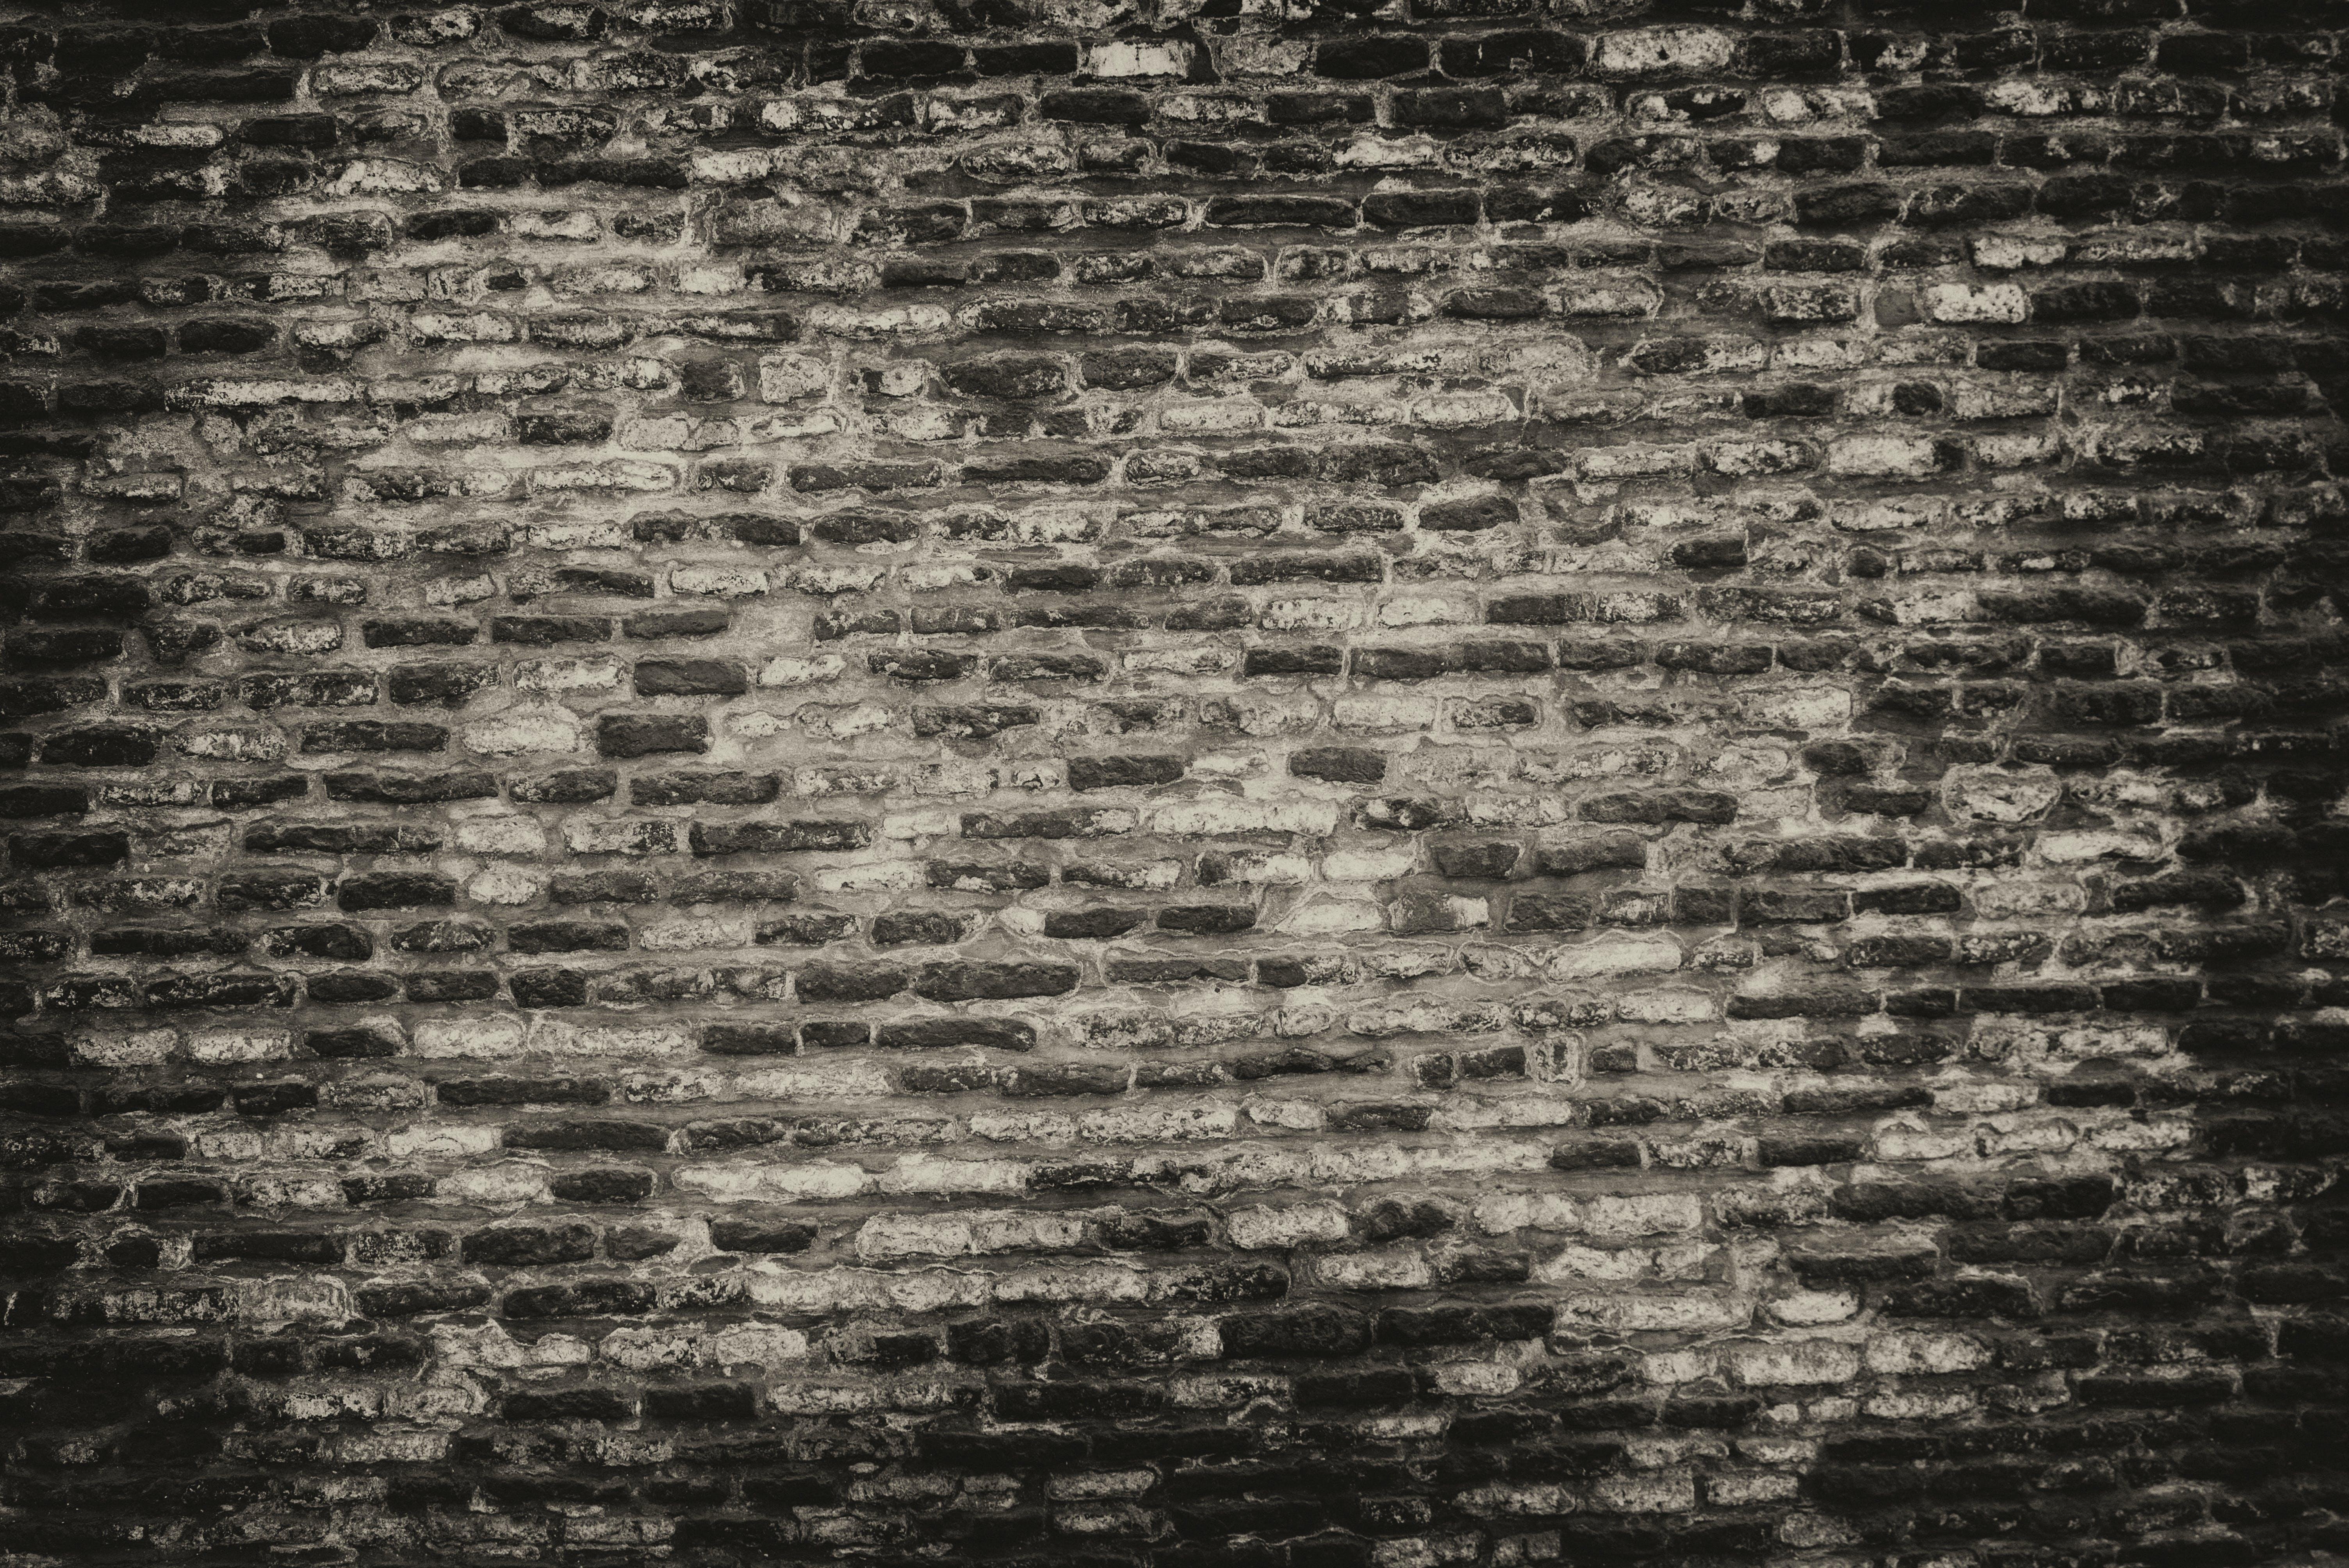 Grayscale Photo of Brickwall